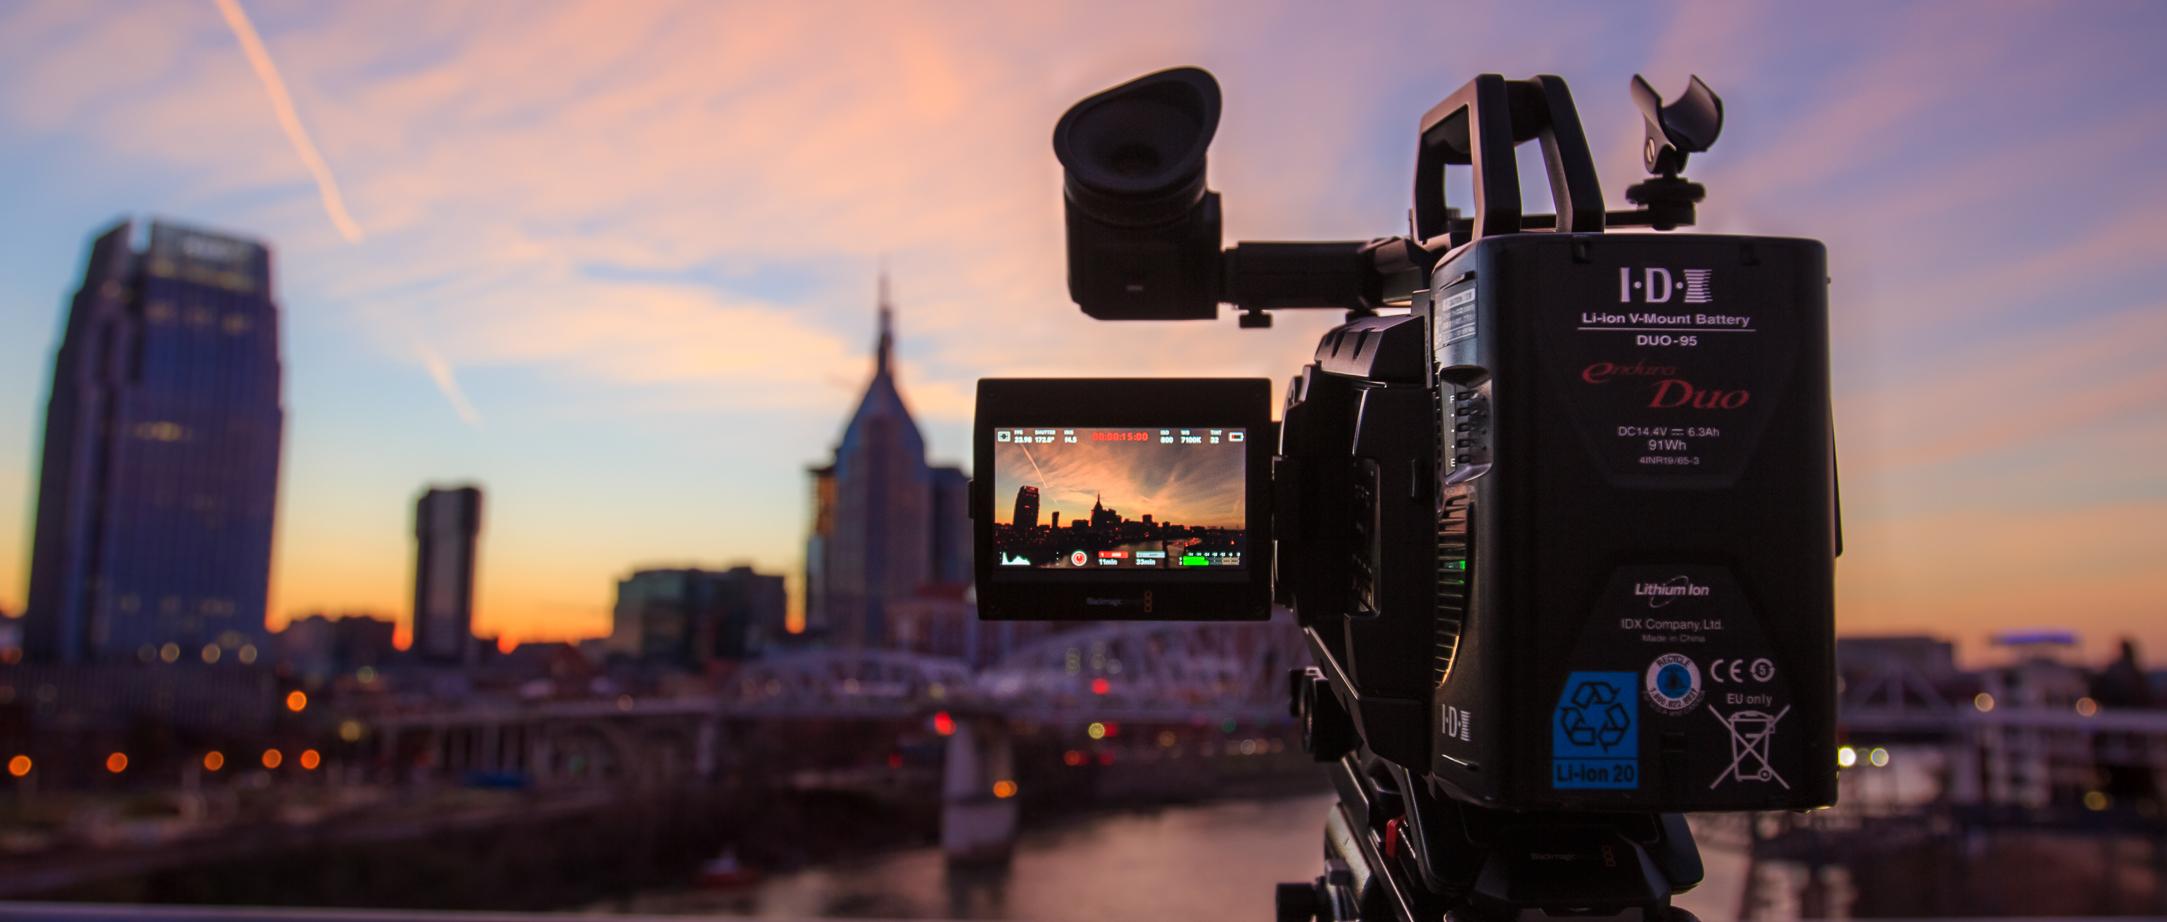 Blackmagic Design Ursa Mini Pro Camera Review